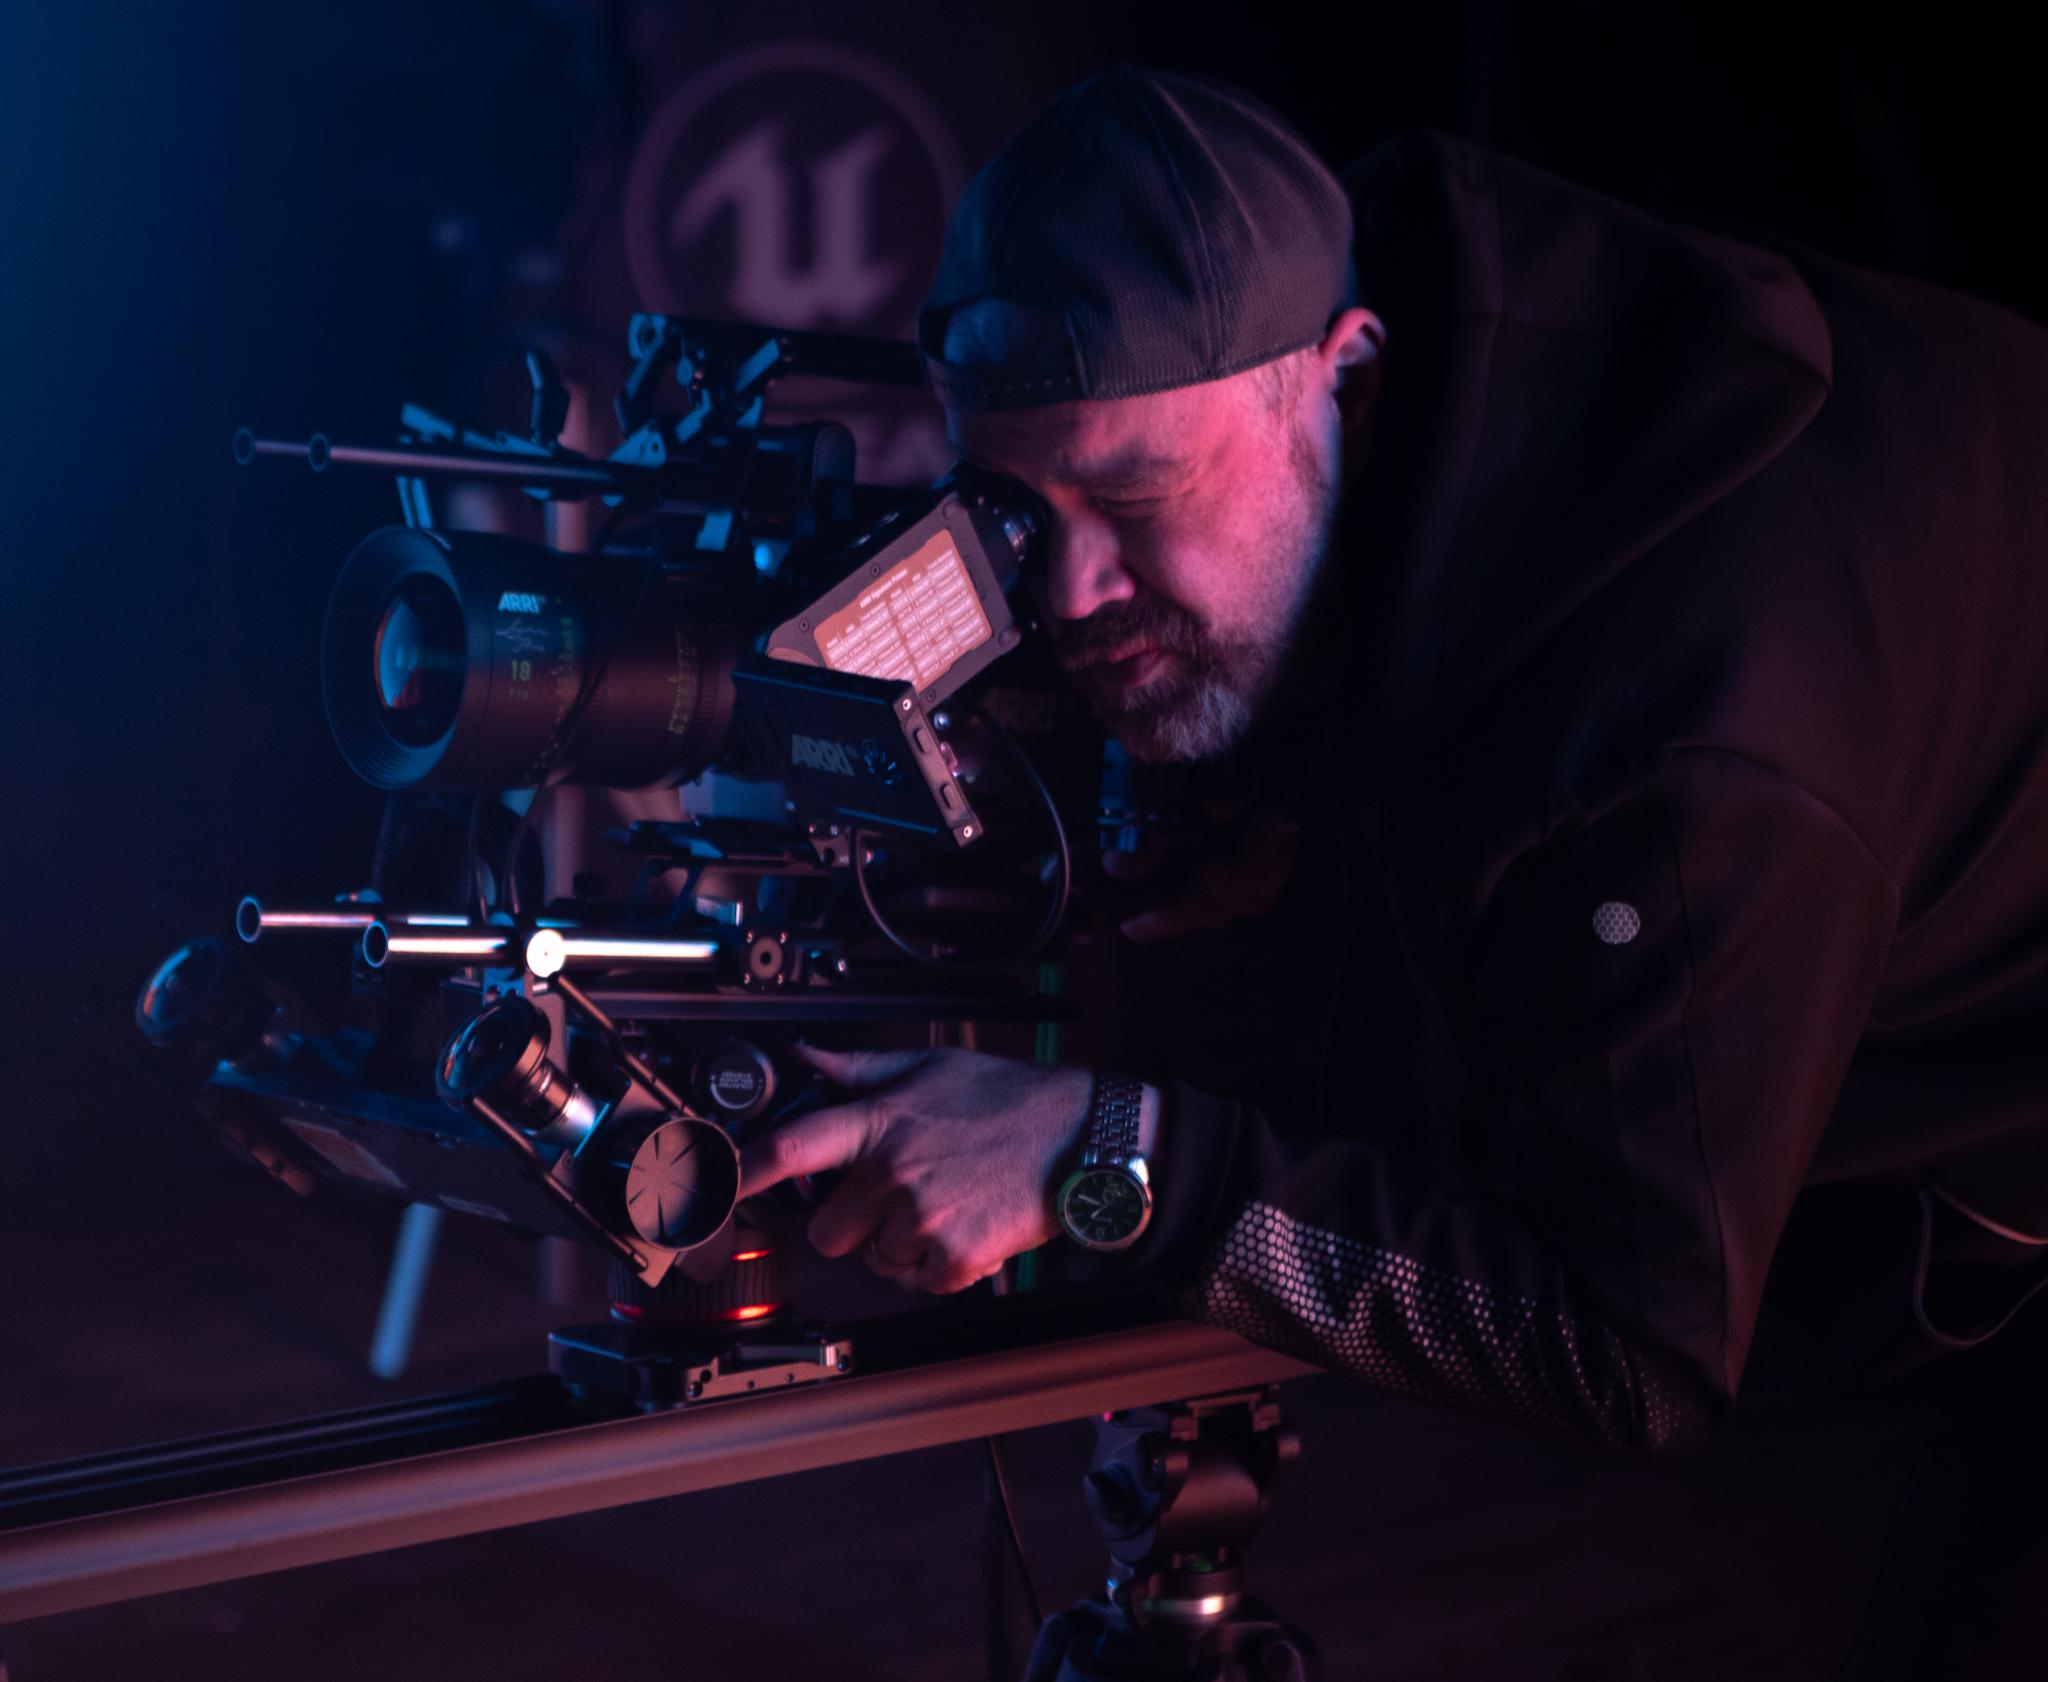 Asa Bailey, Virtual Production Director, On-Set Facilities